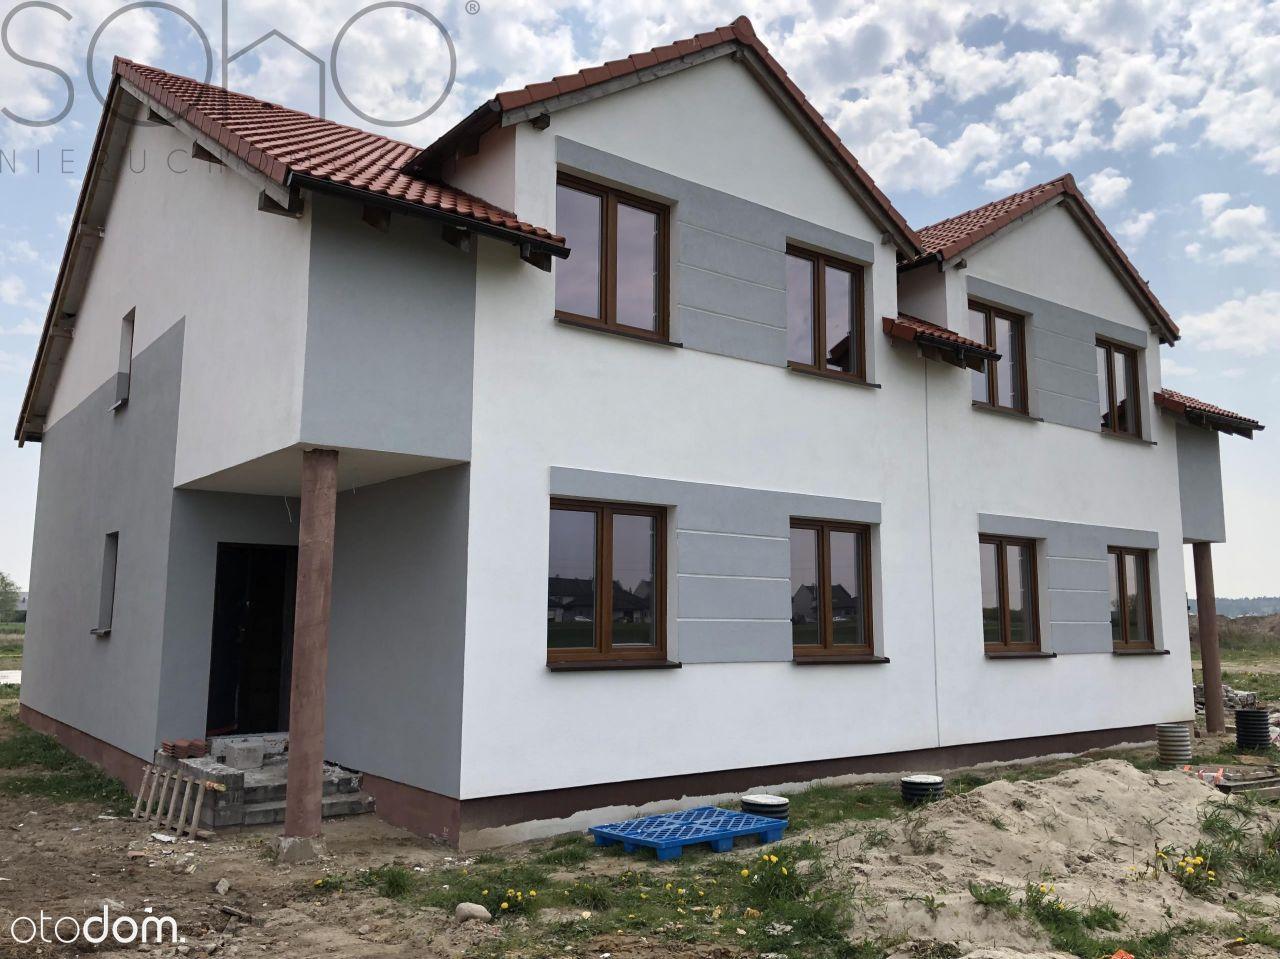 Mieszkanie, 70 m², Dachowa